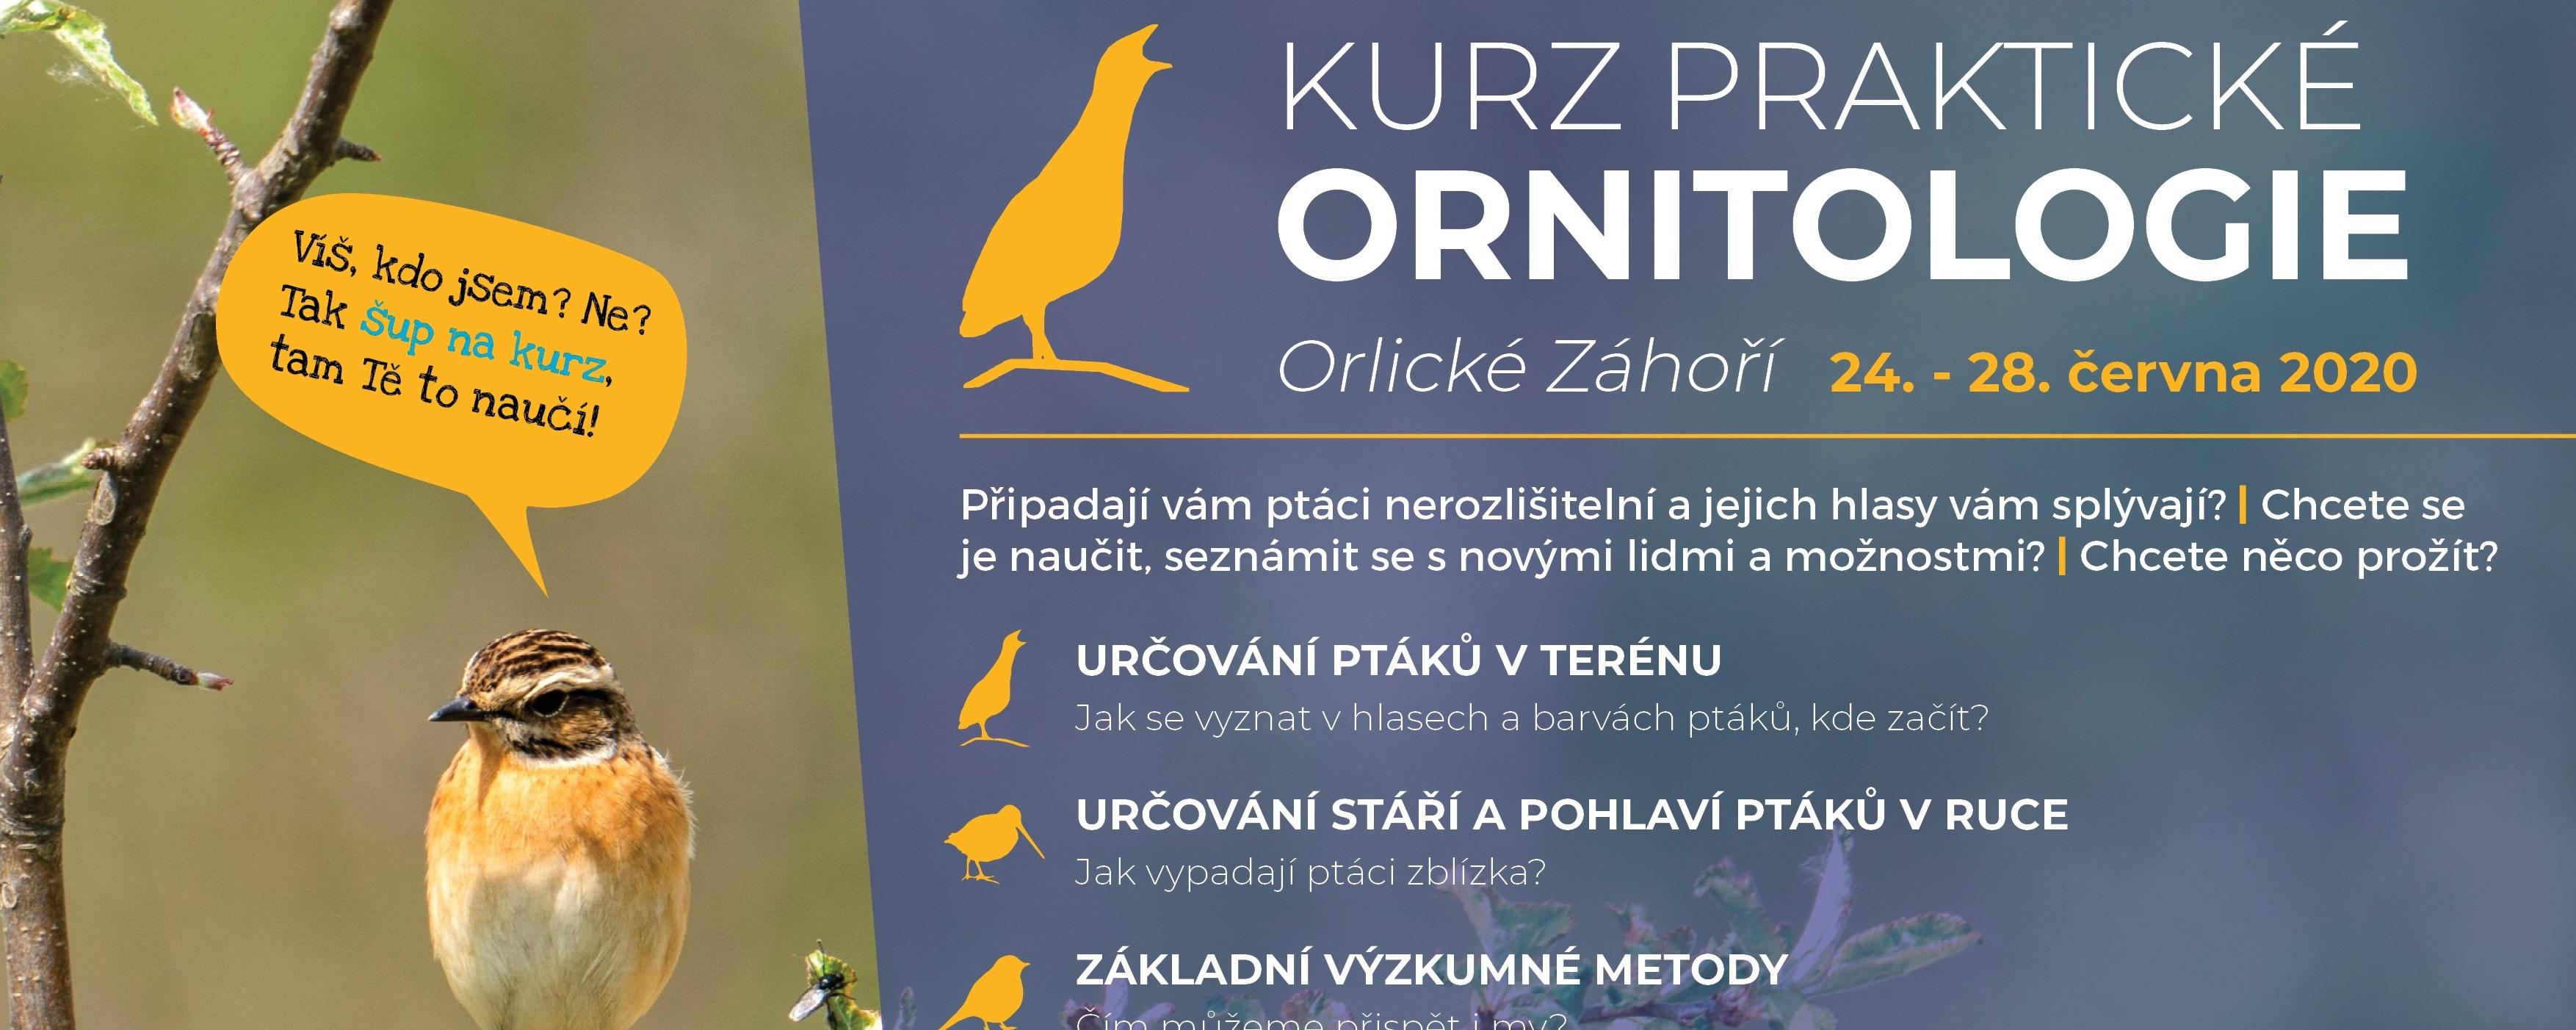 Kurz praktické ornitologie